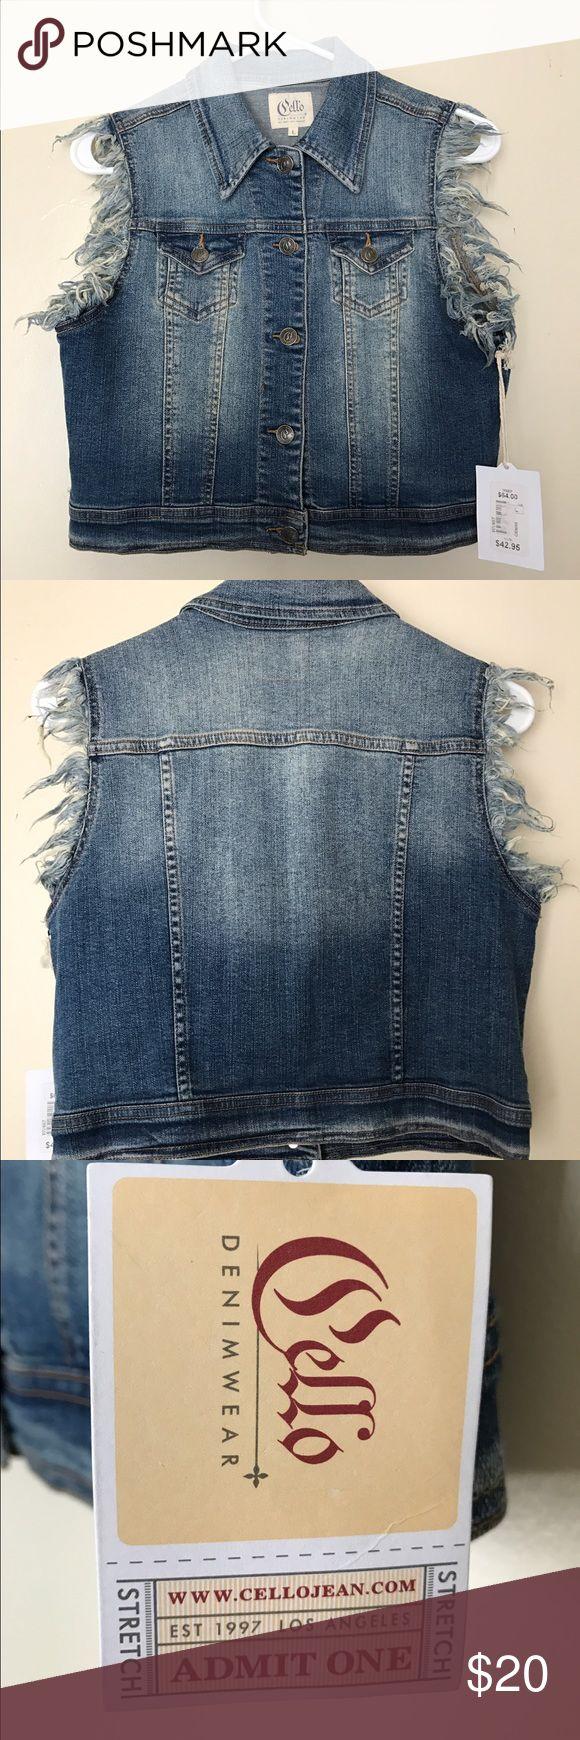 Cello sleeveless denim jacket Brand new denim jacket Cello Jeans Jackets & Coats Jean Jackets